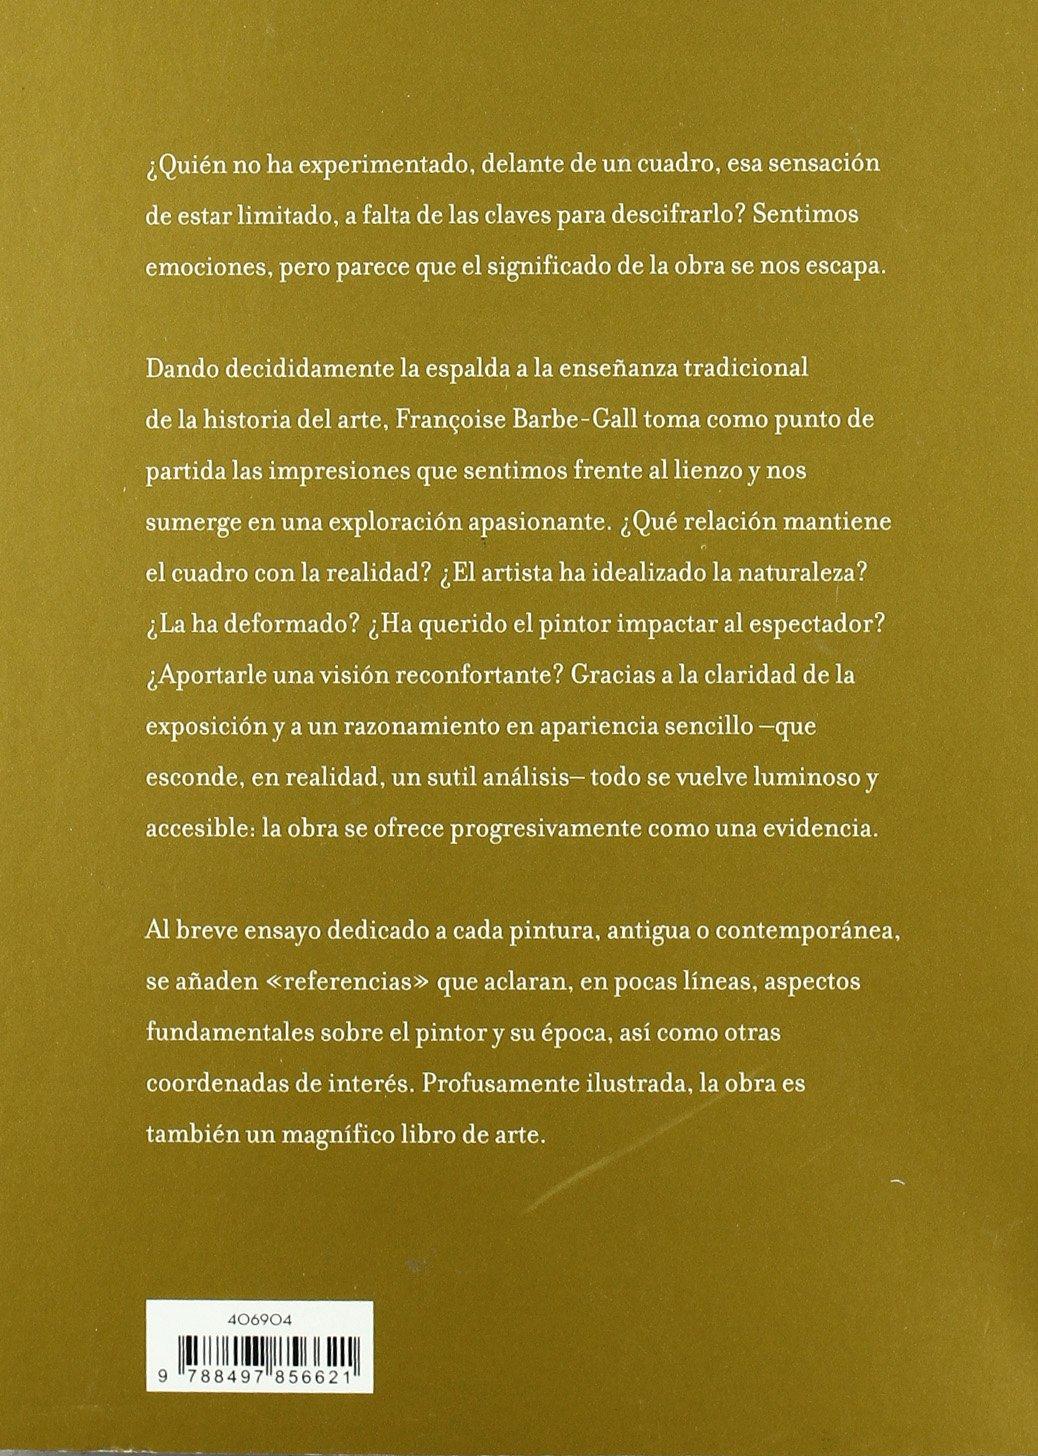 Cómo mirar un cuadro (Arte e Historia): Amazon.es: Françoise Barbe-Gall: Libros